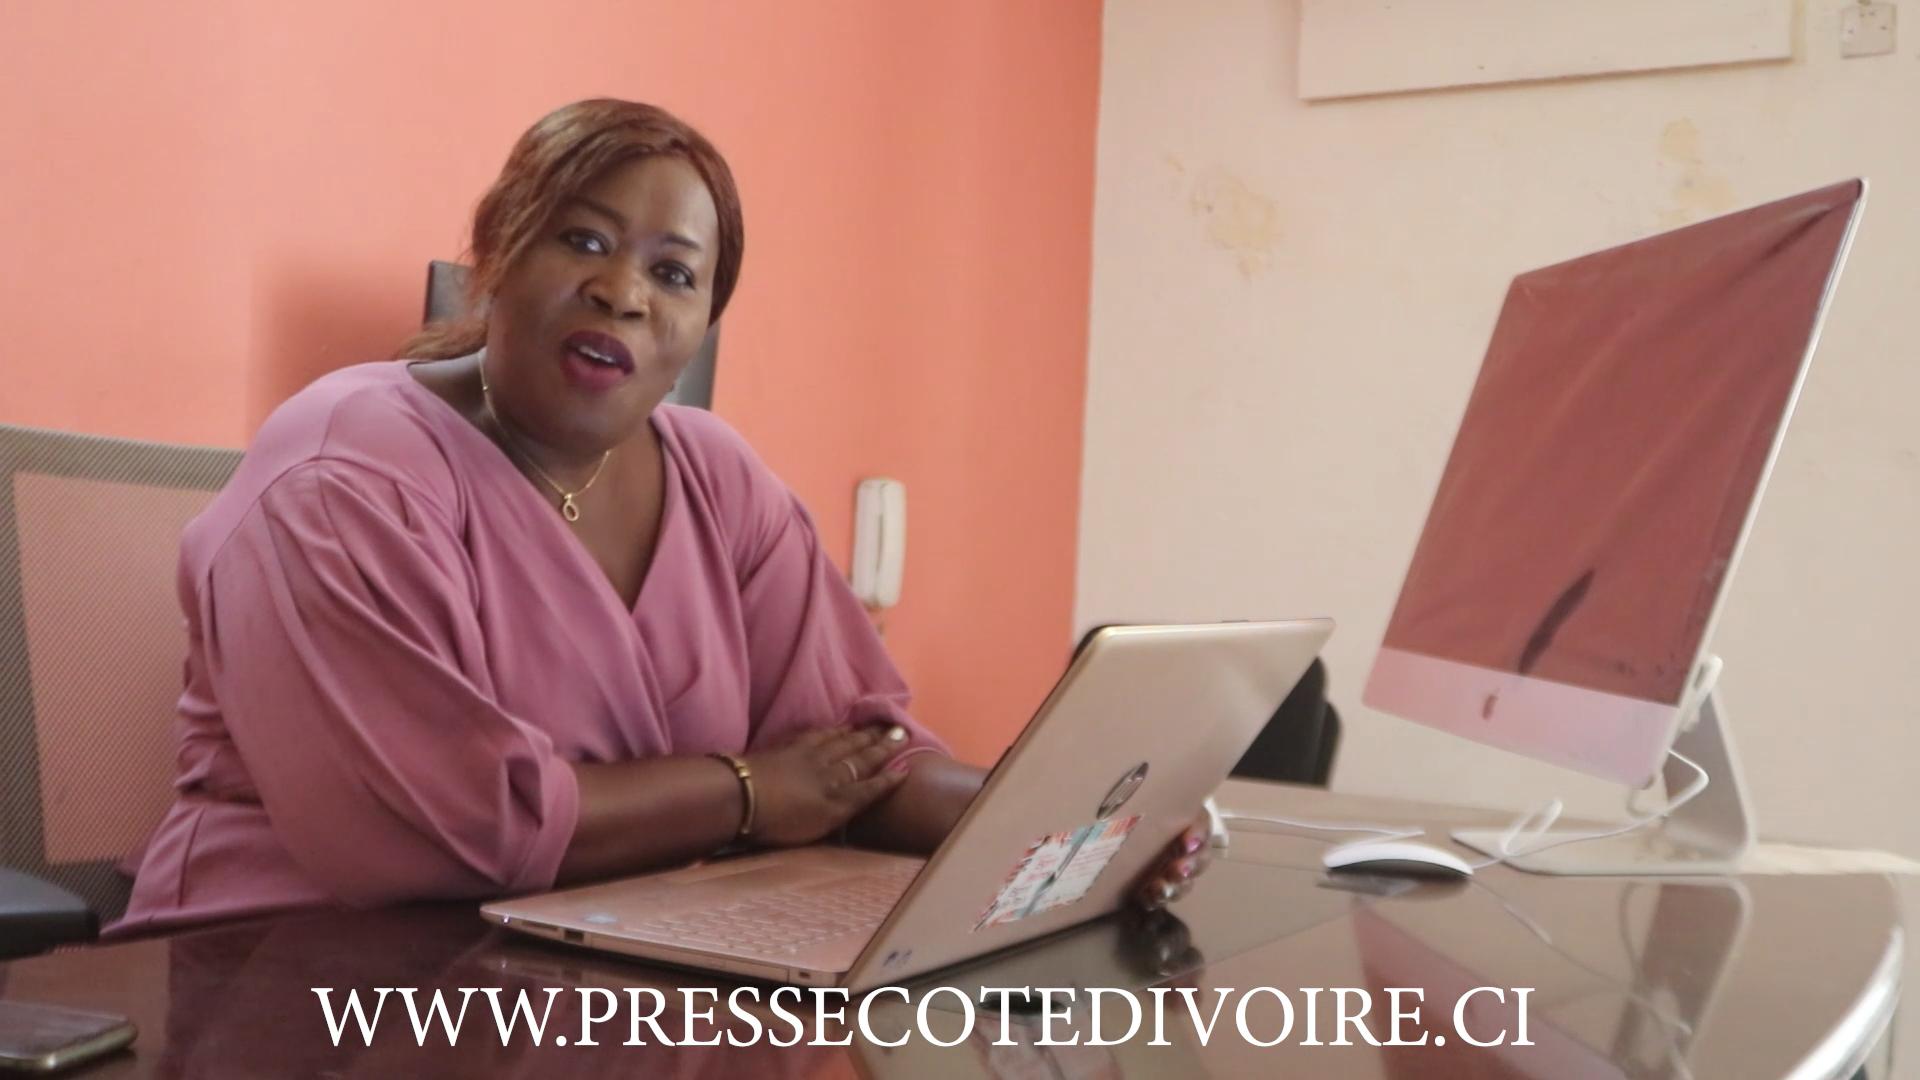 revue-de-presse-en-video-de-wwwpressecotedivoireci